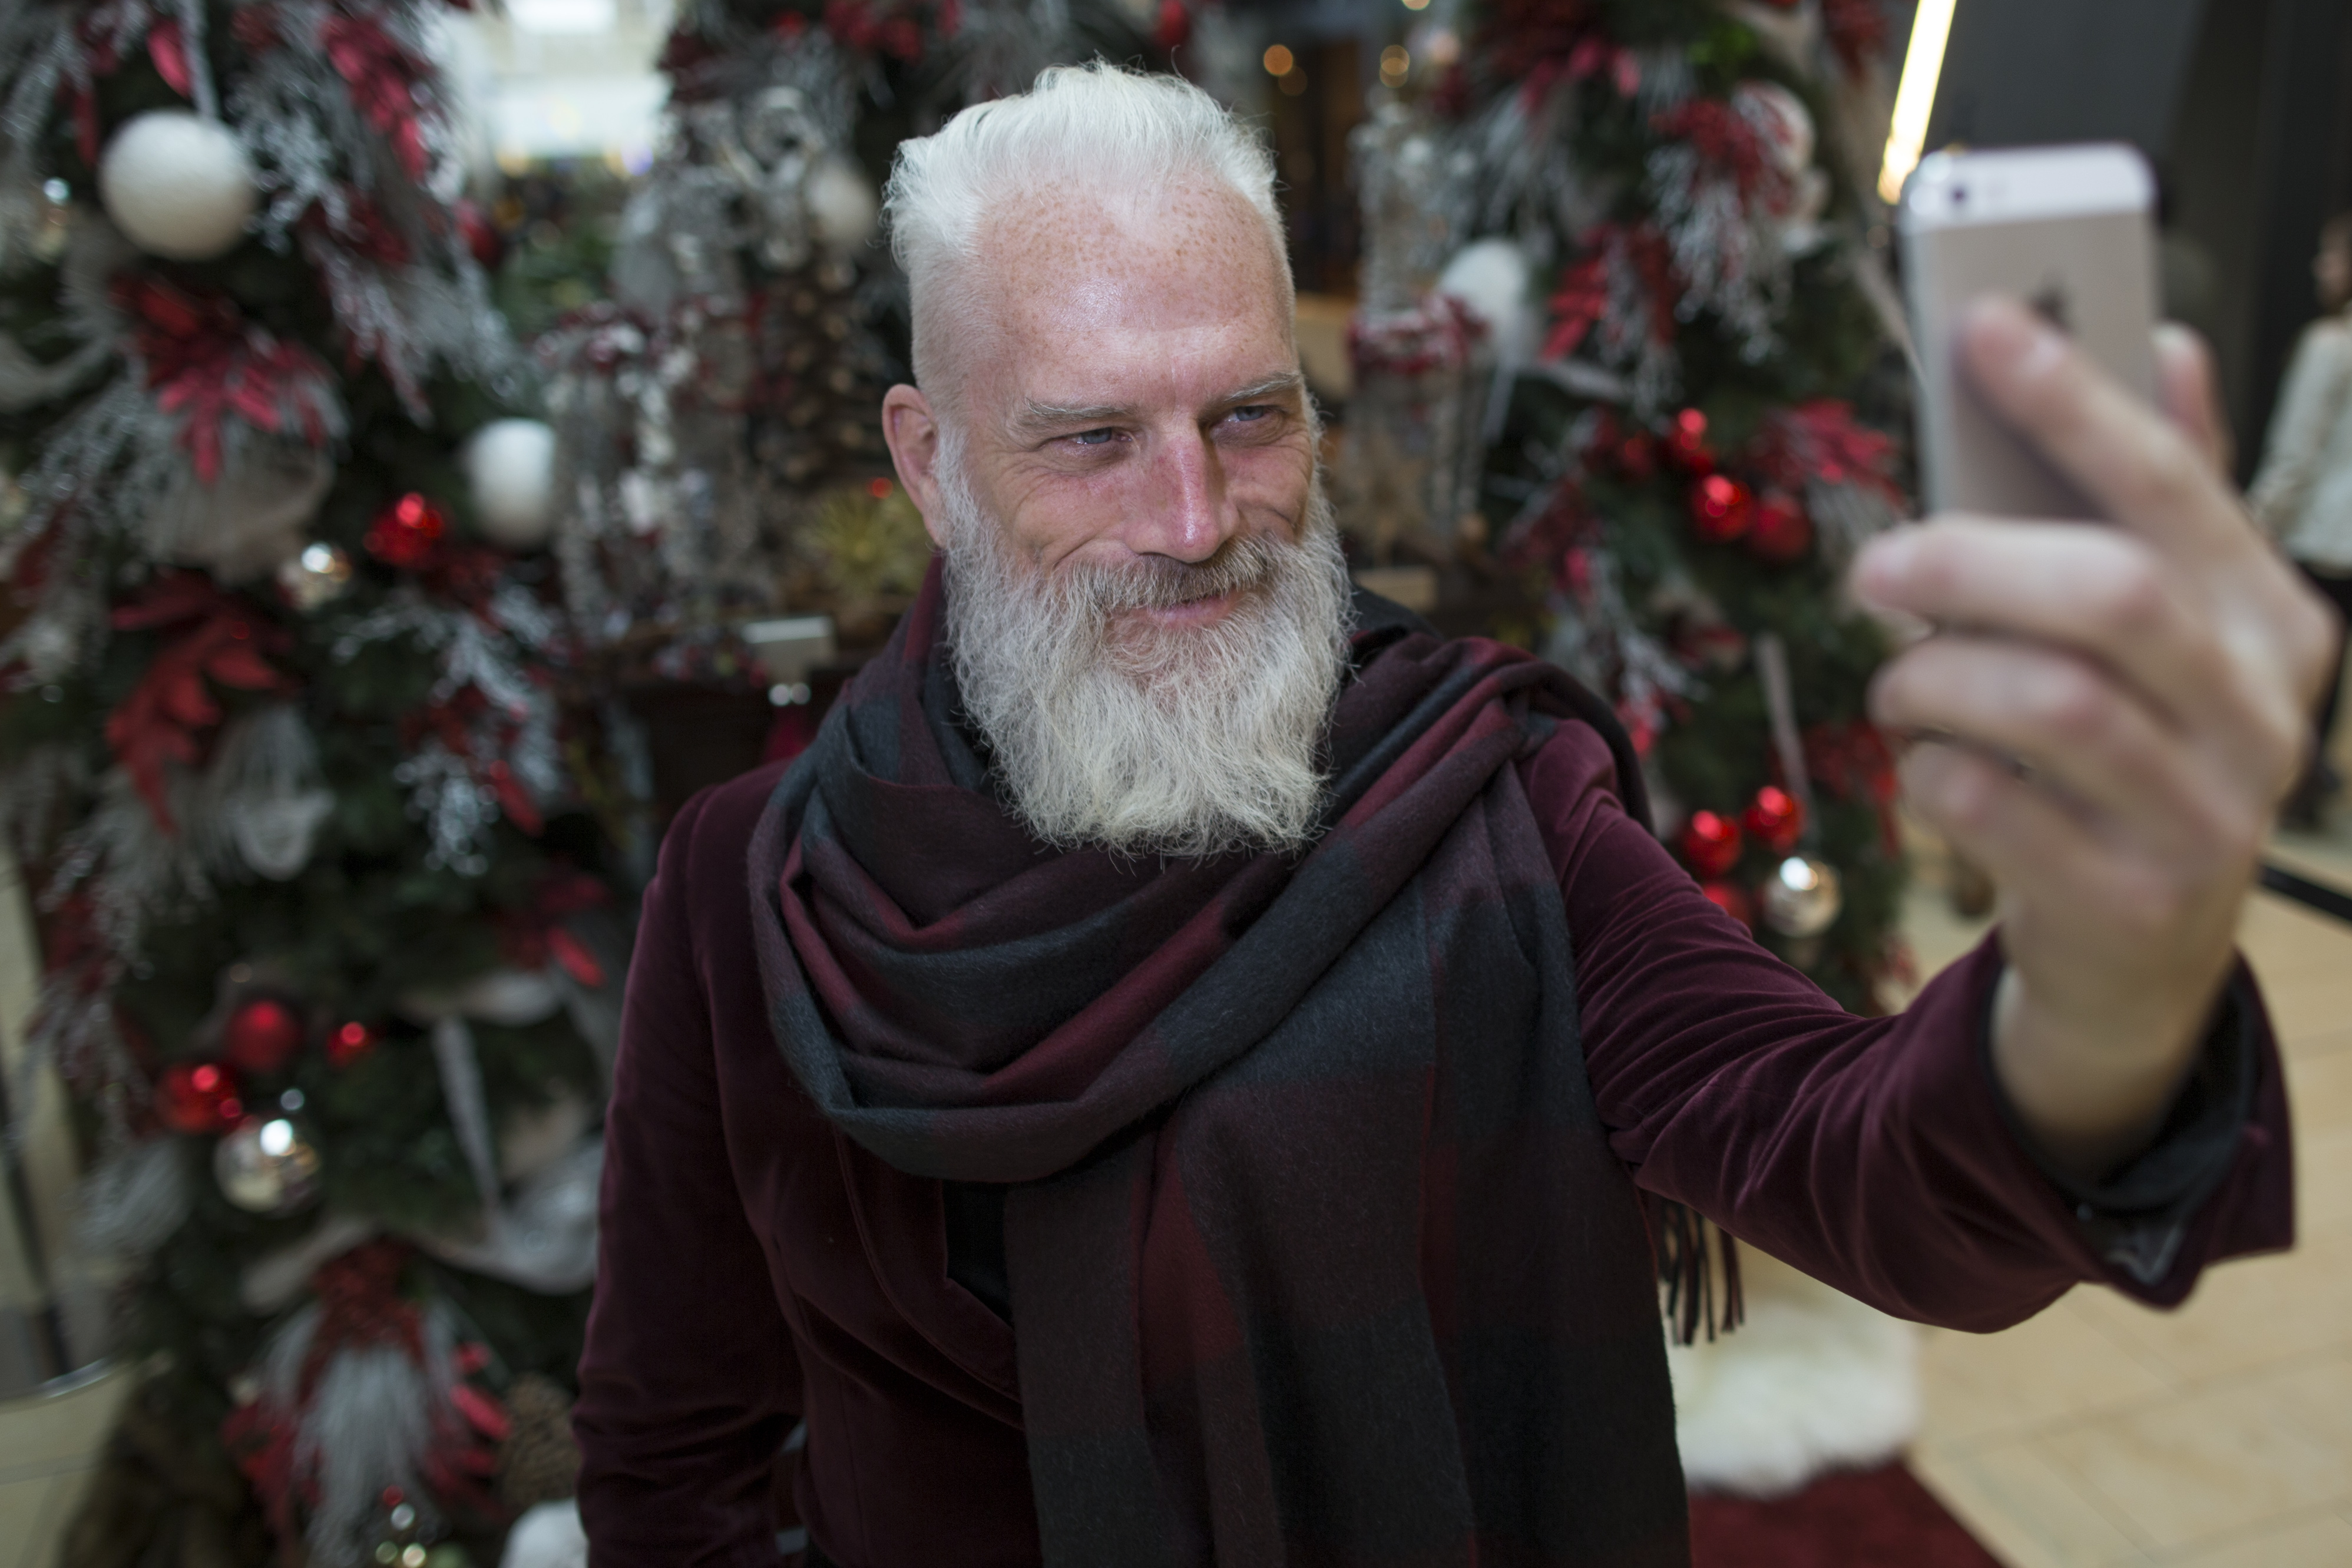 Fashion Santa\u0027 Delights Internet With Modern Makeover